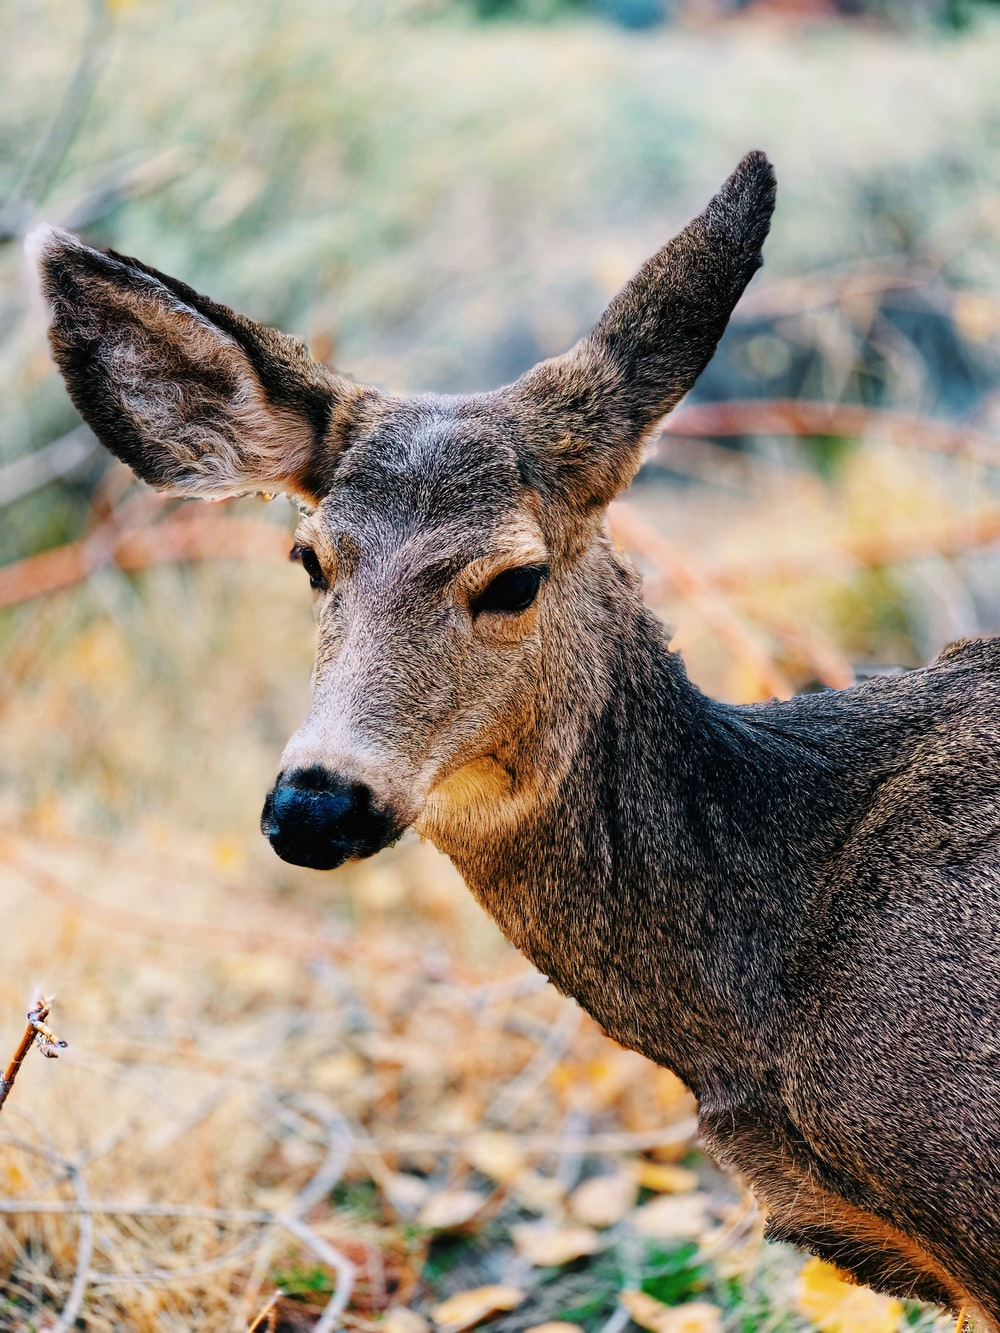 brown and gray deer